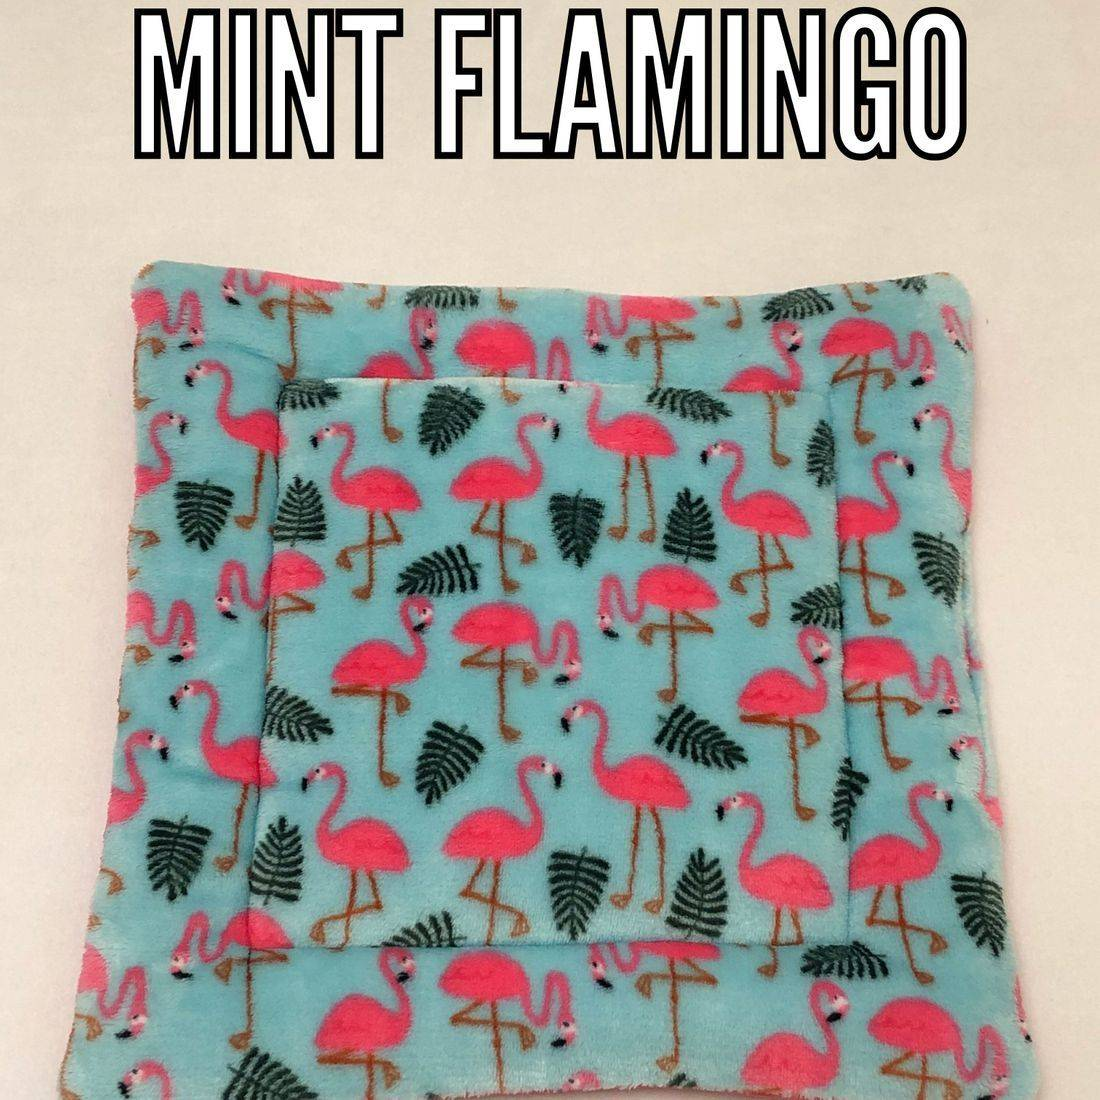 mint Flamingo fabric